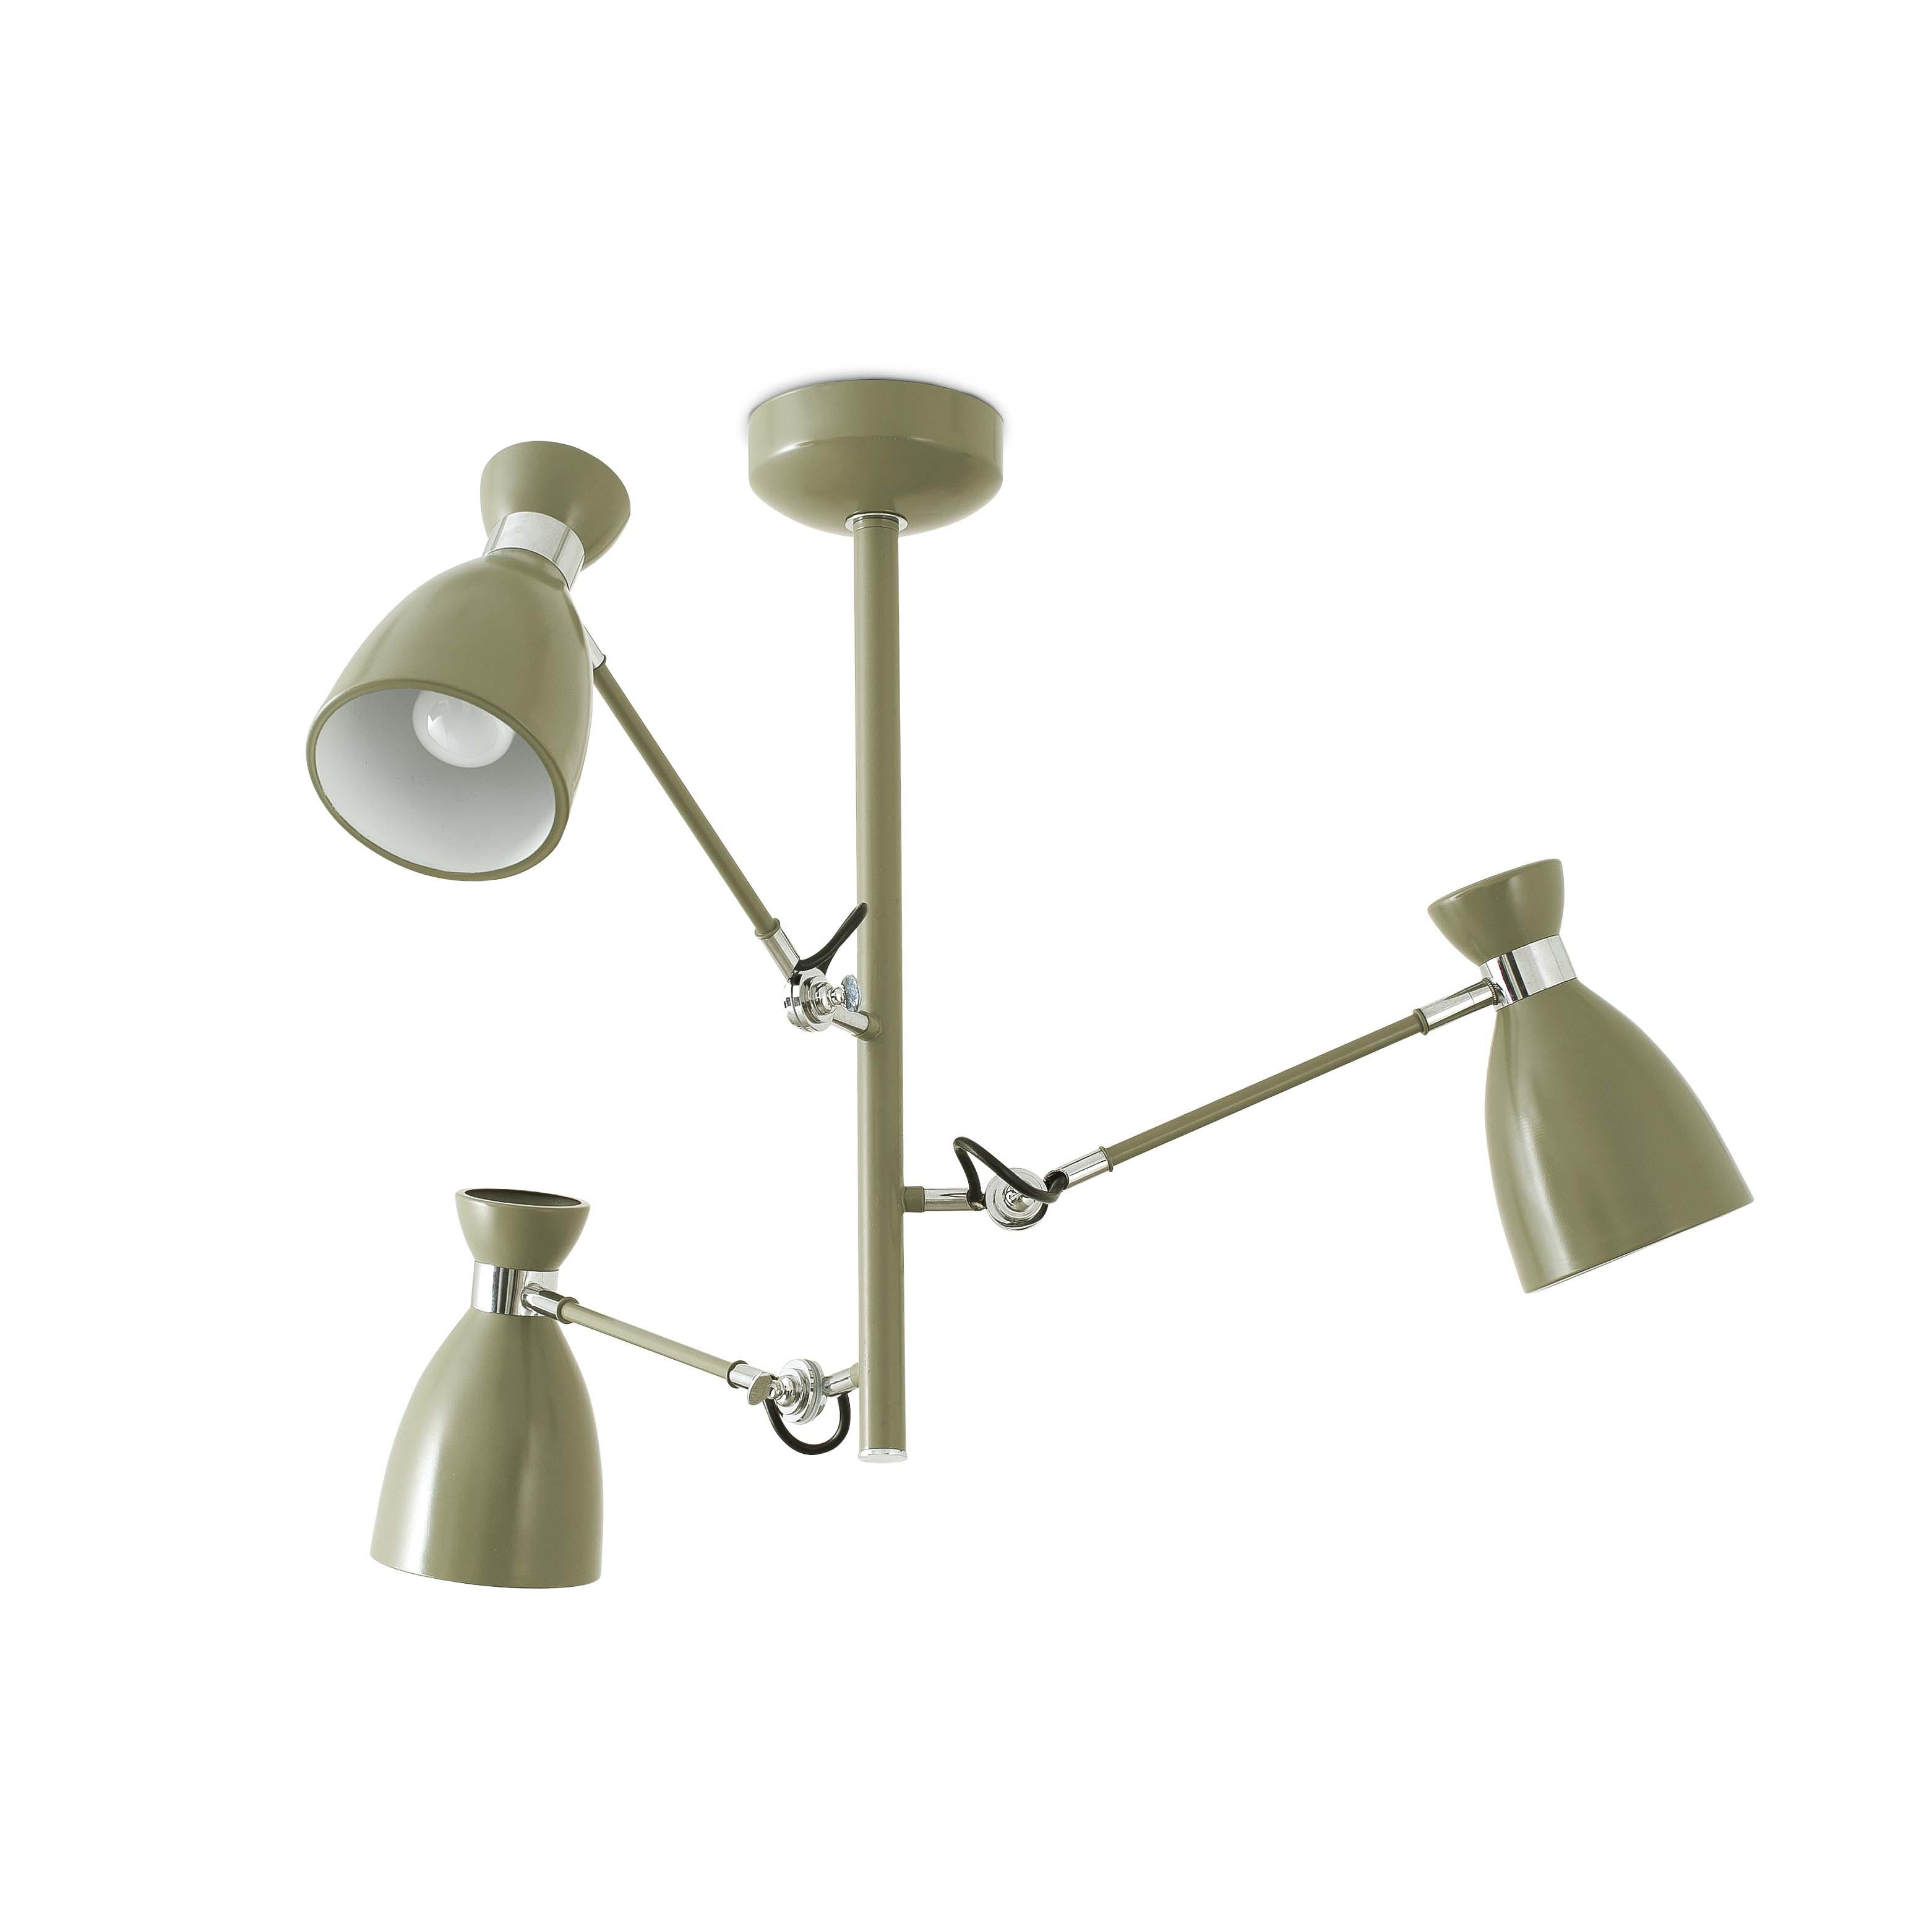 Hanglamp olijf groen retro design E14 3 armen 20007